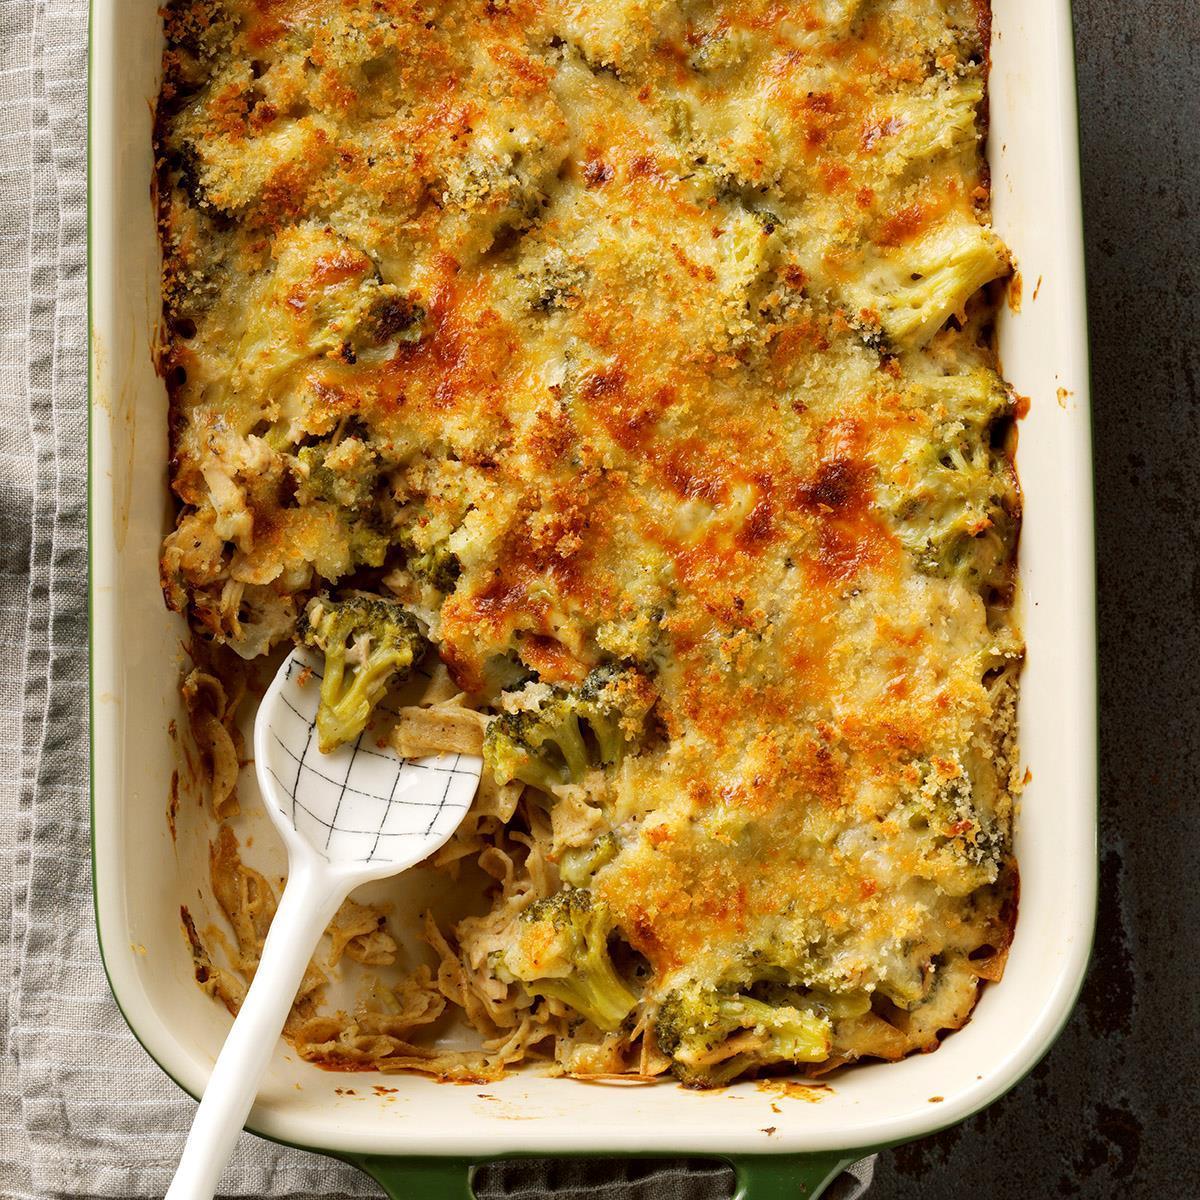 Broccoli Tuna Casserole Recipe How To Make It Taste Of Home